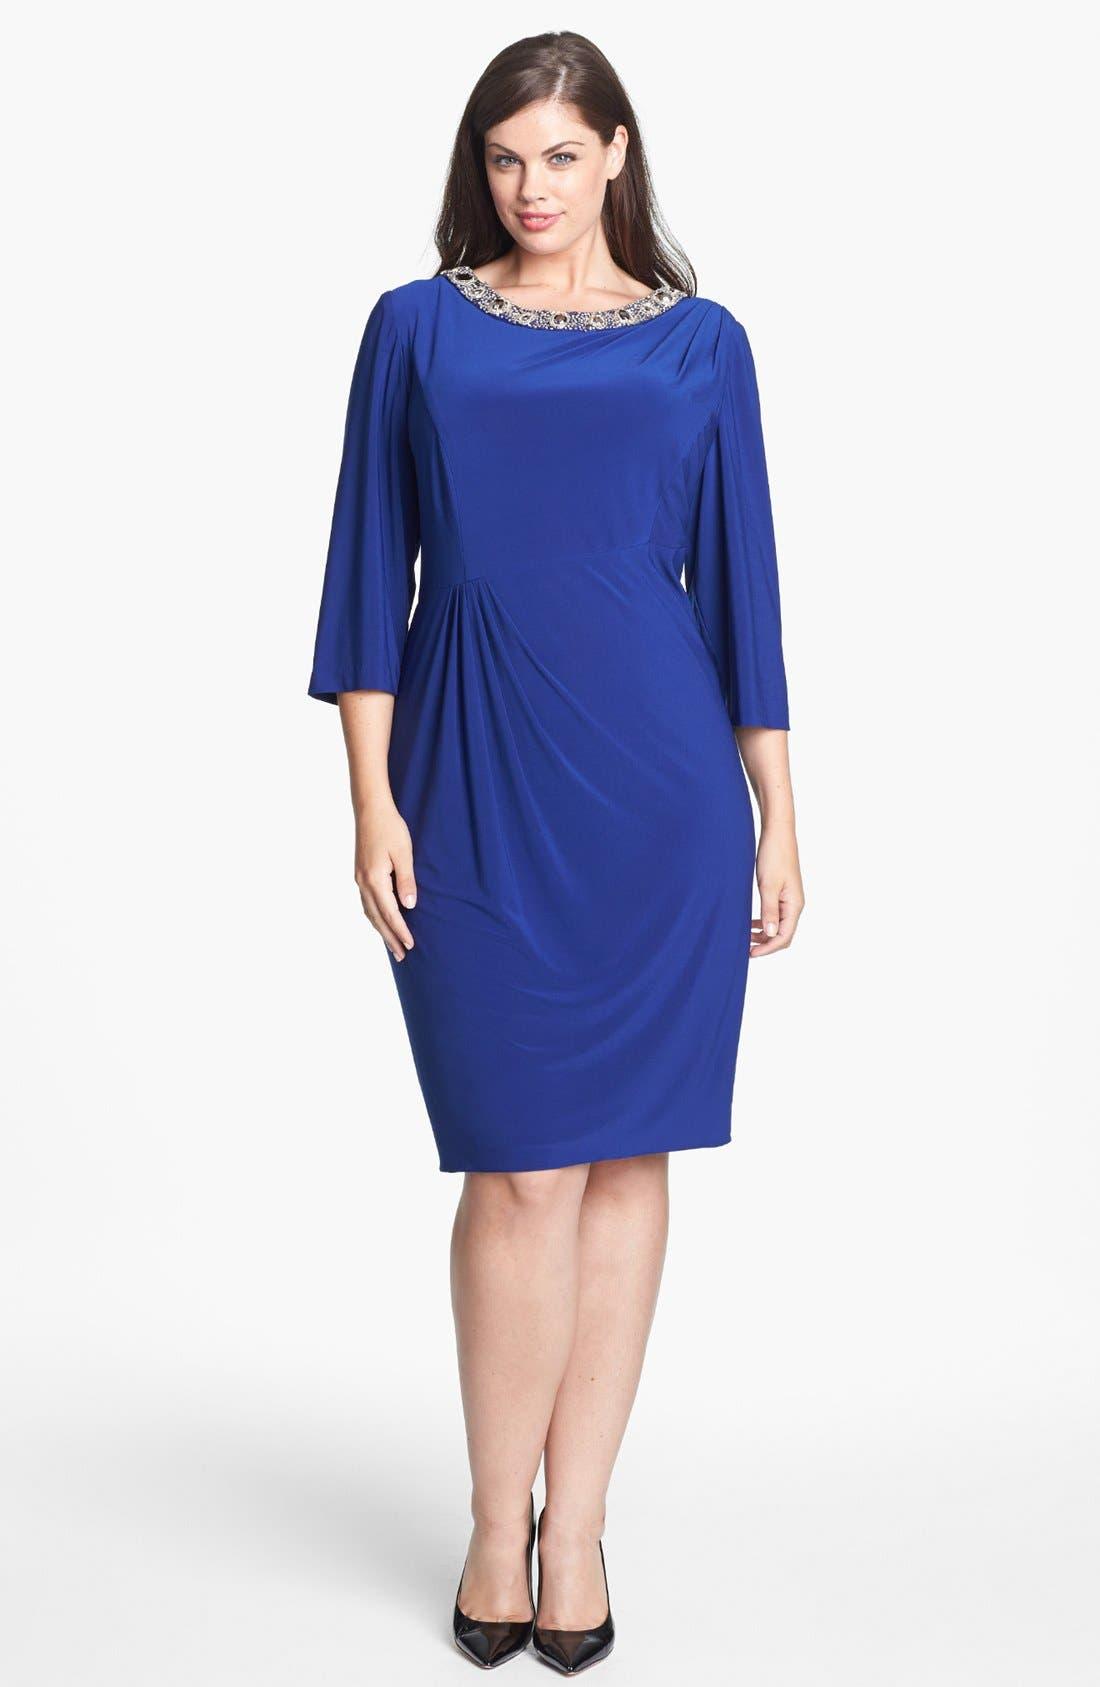 Alternate Image 1 Selected - Alex Evenings Embellished Side Draped Jersey Dress (Plus Size)